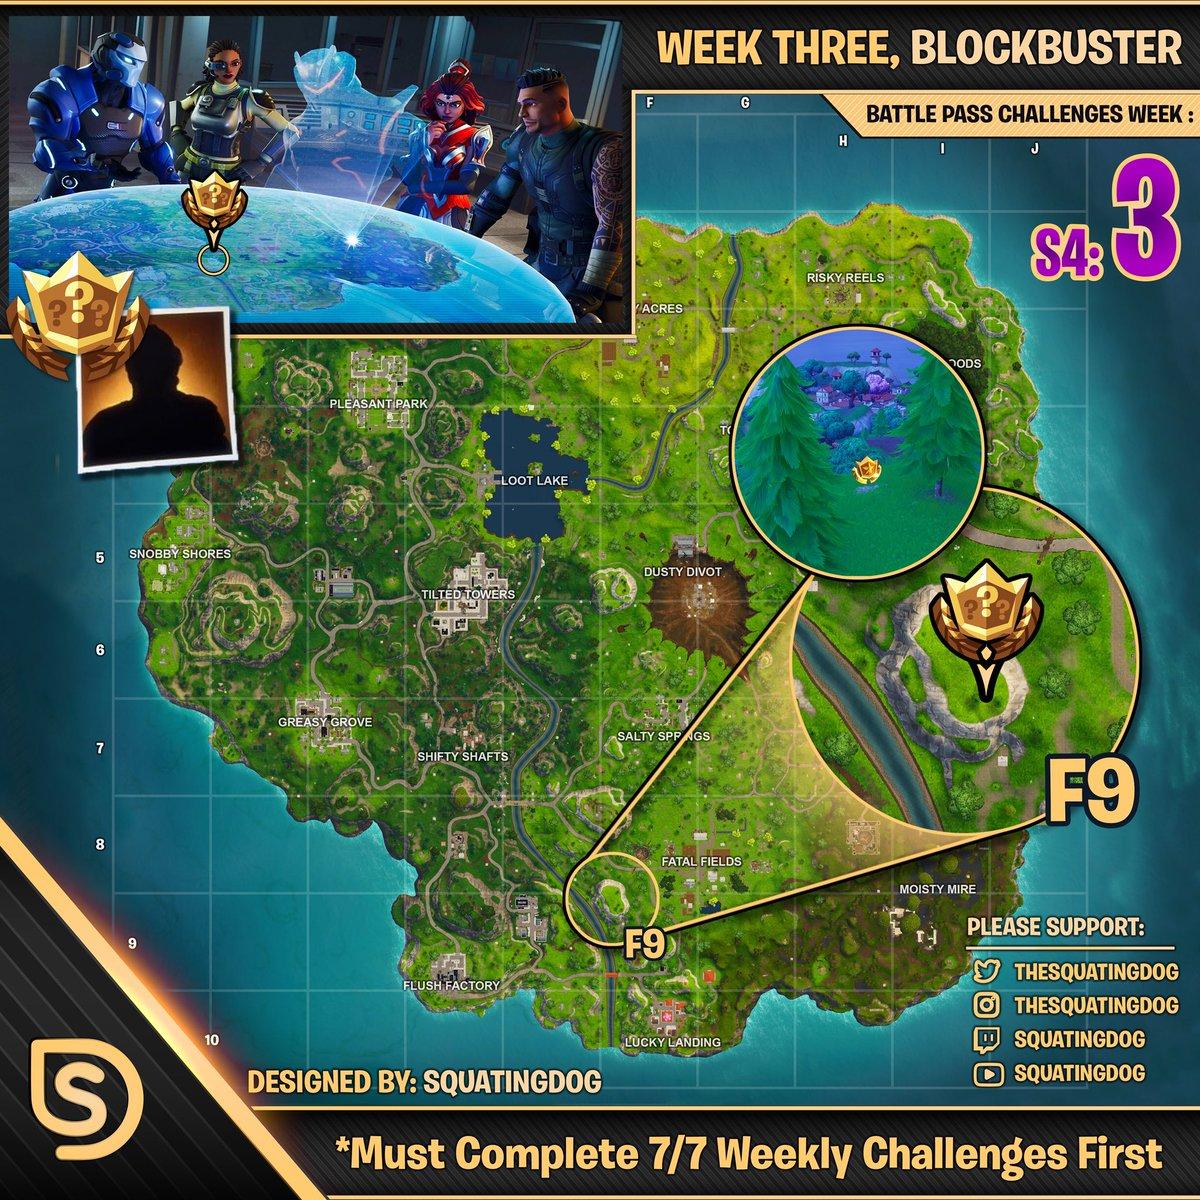 Season 4 Week 3 Blockbuster Challenge Map Wheel Of Fortnite